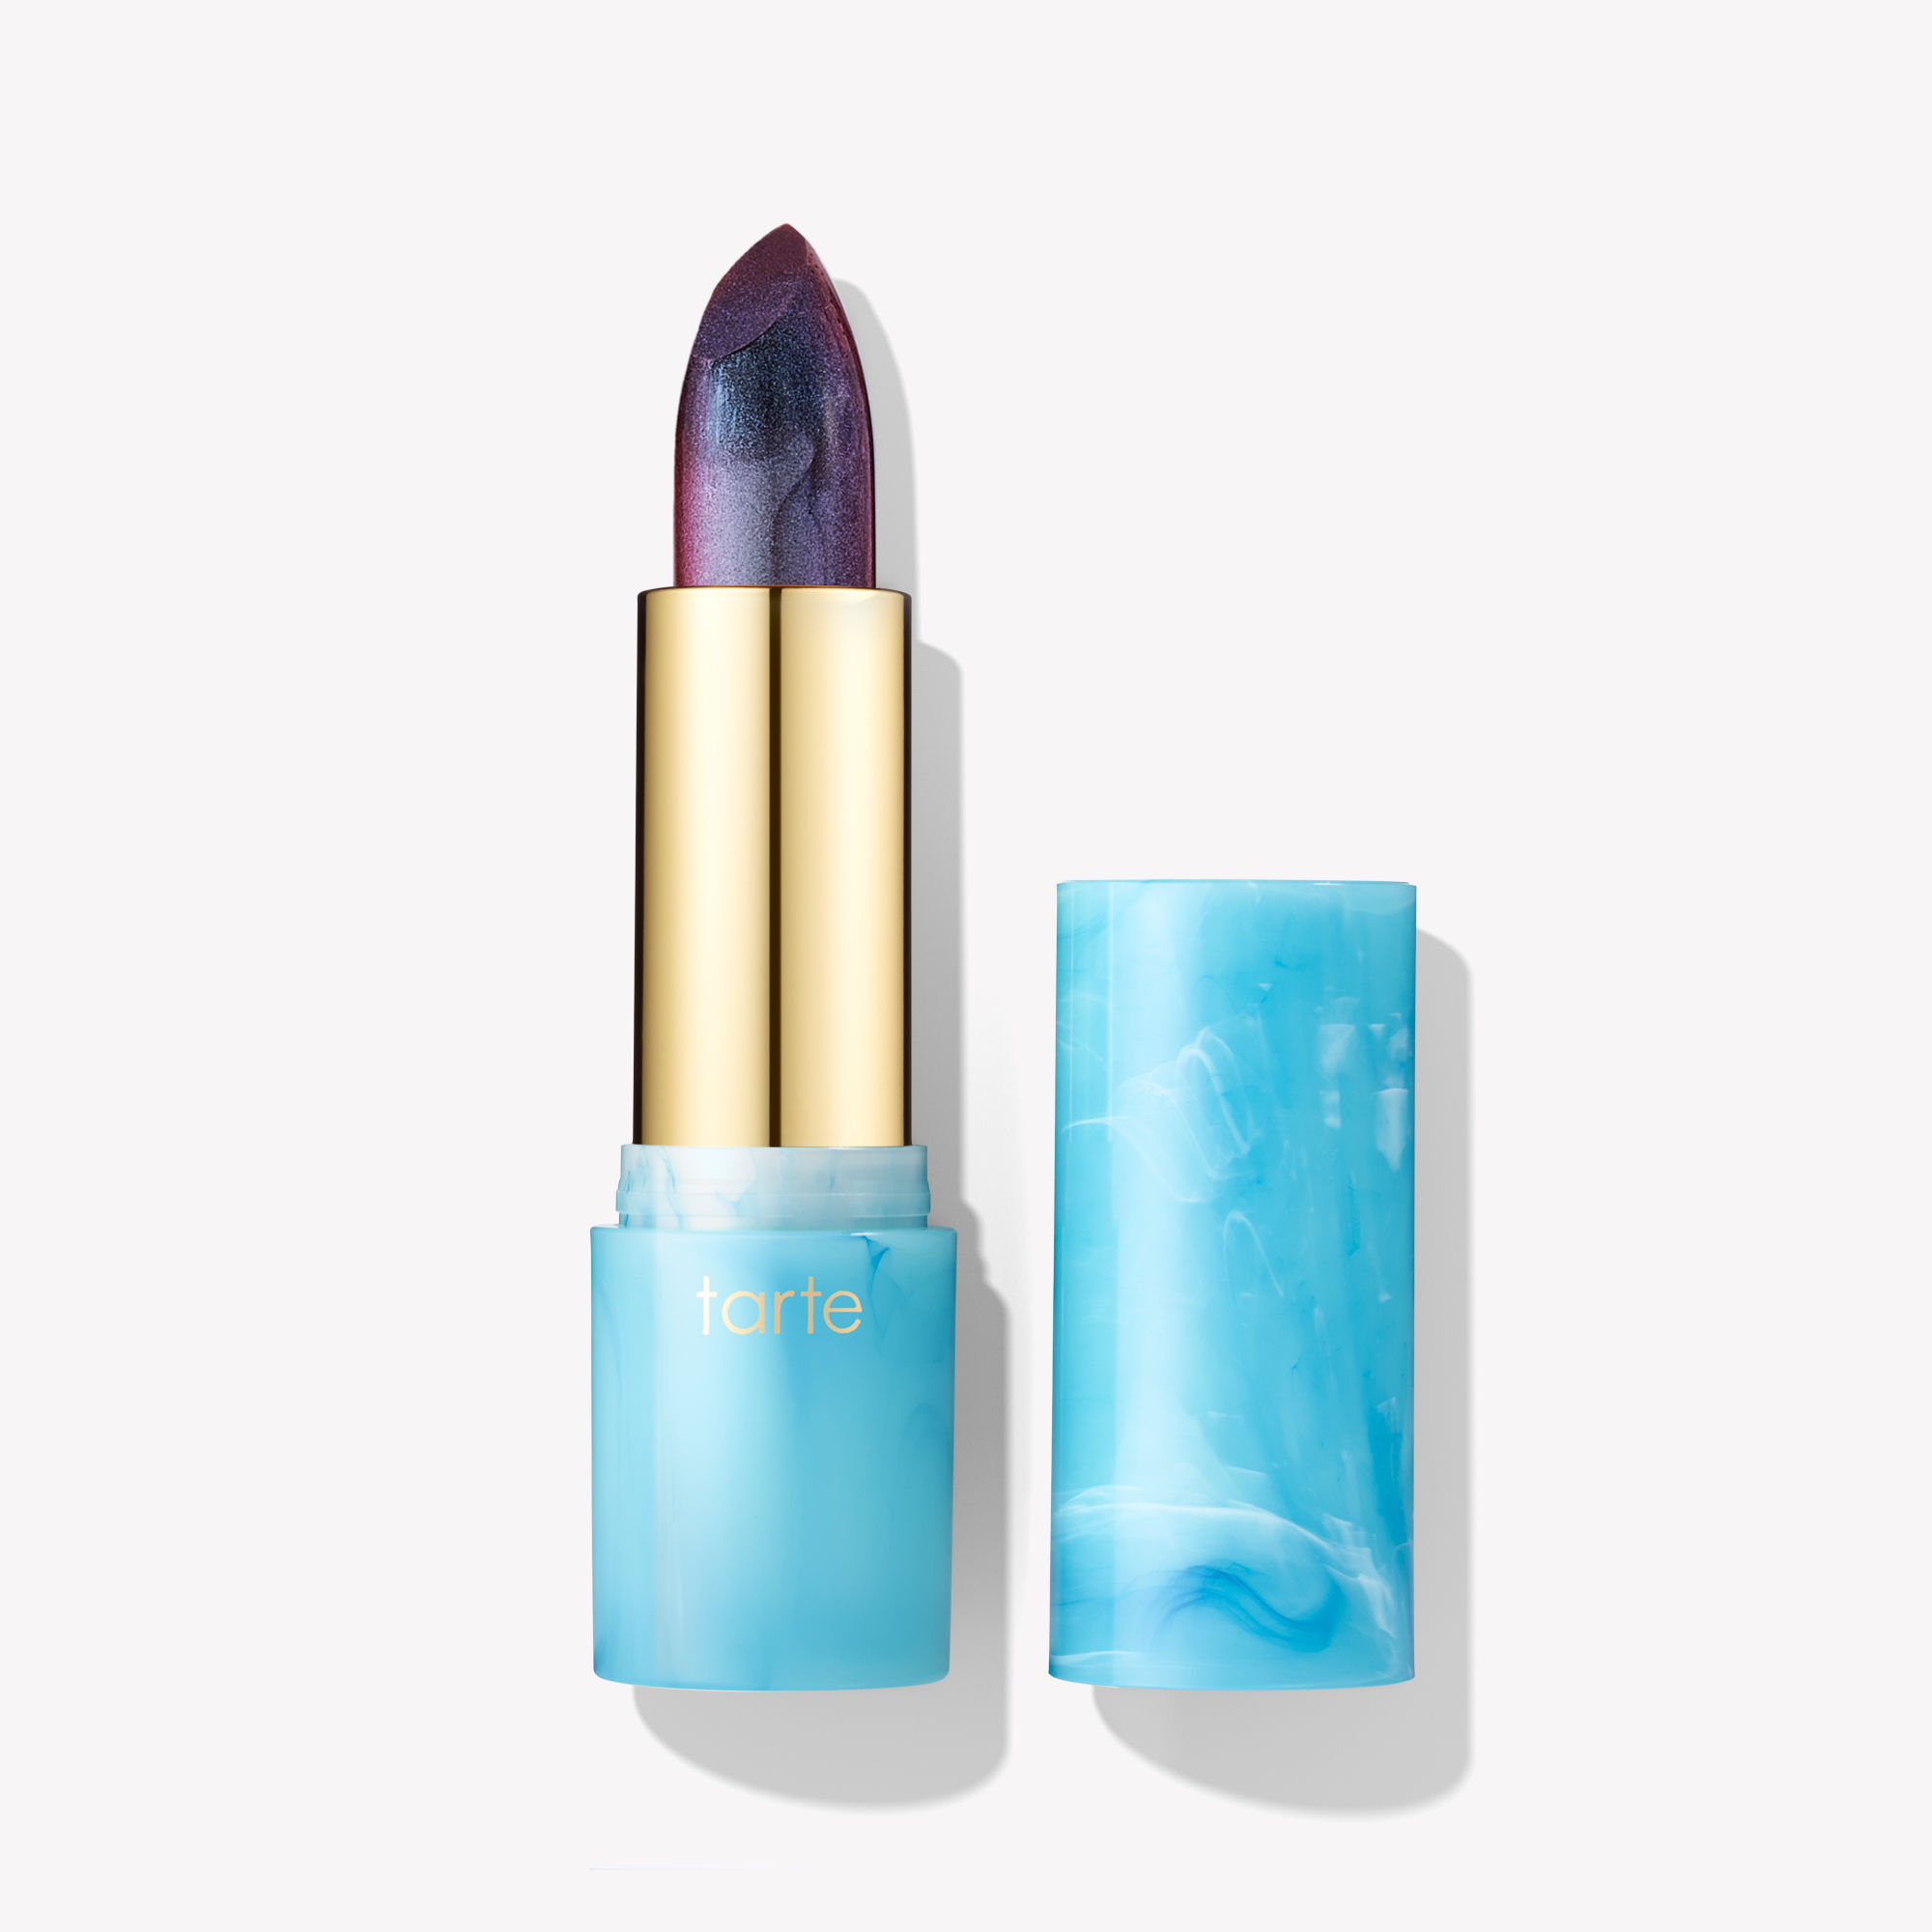 tarte Color Splash Shade Shifting Lipstick - Rainforest of the Sea(TM) Collection Pink Sand 0.12 oz / 3.4 g